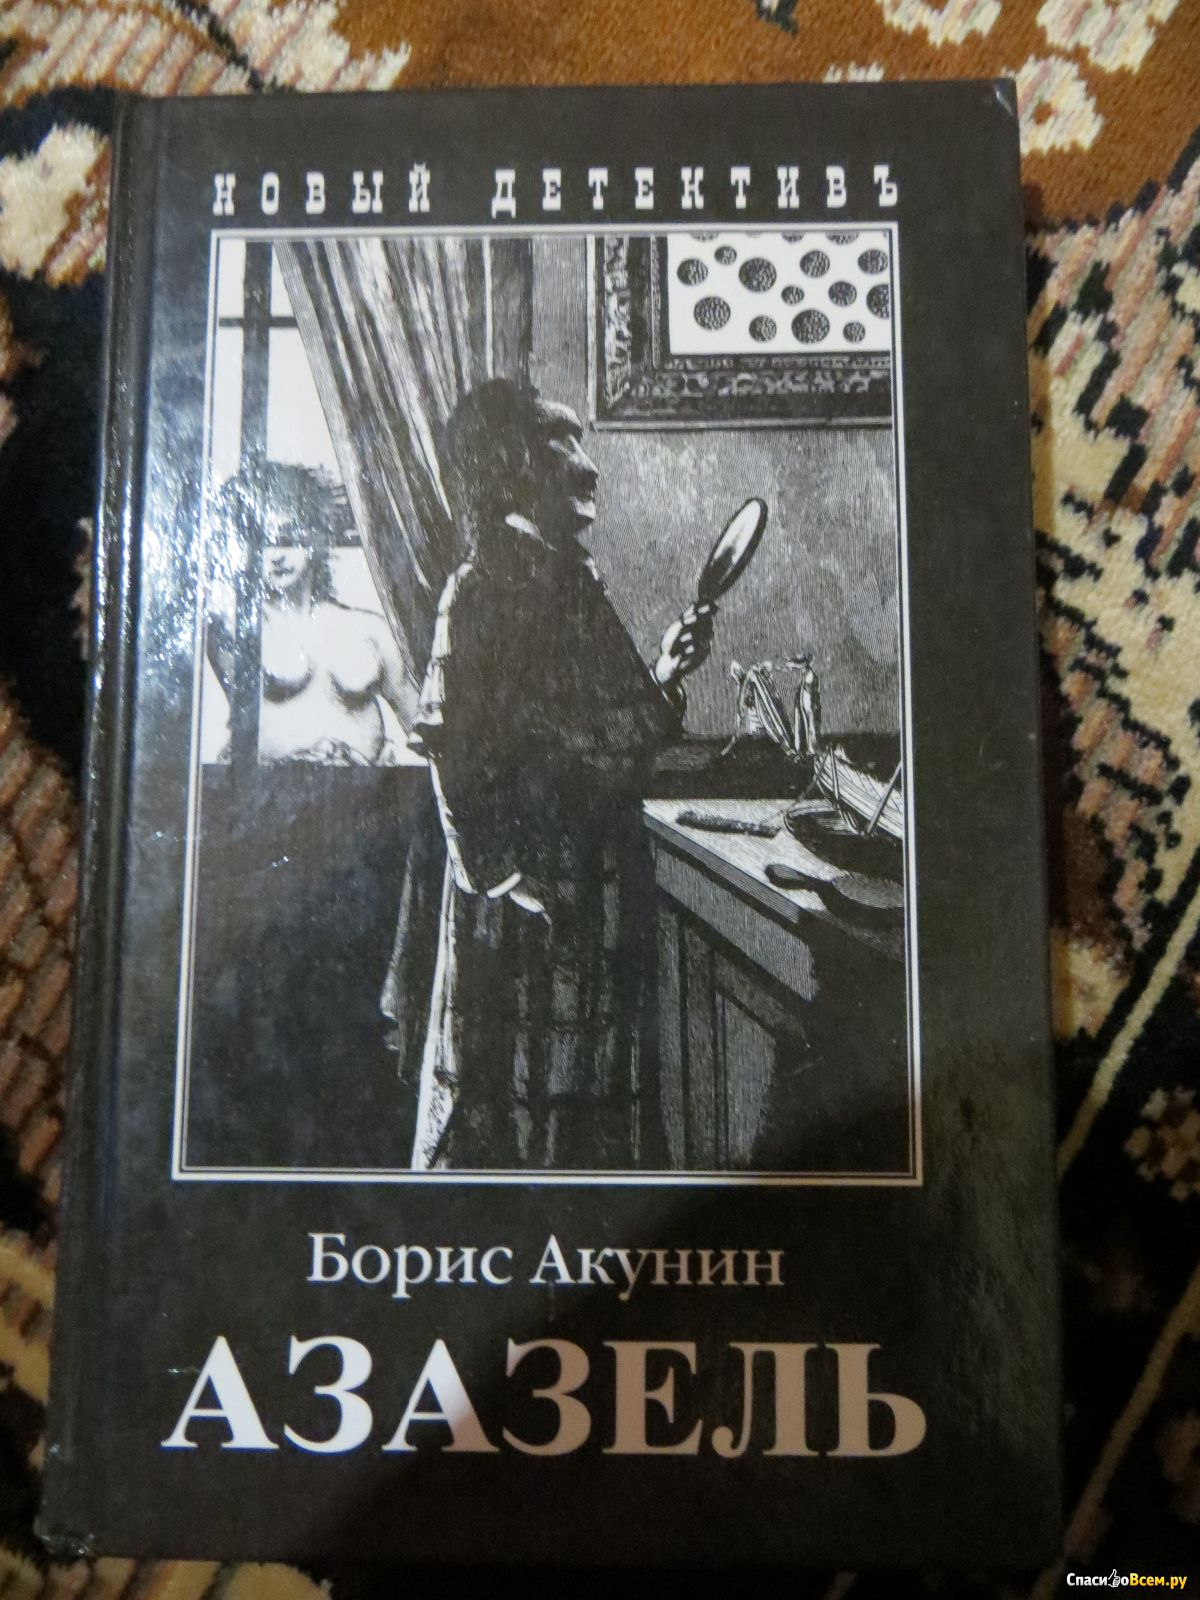 АХИМАС БОРИС АКУНИН СКАЧАТЬ БЕСПЛАТНО